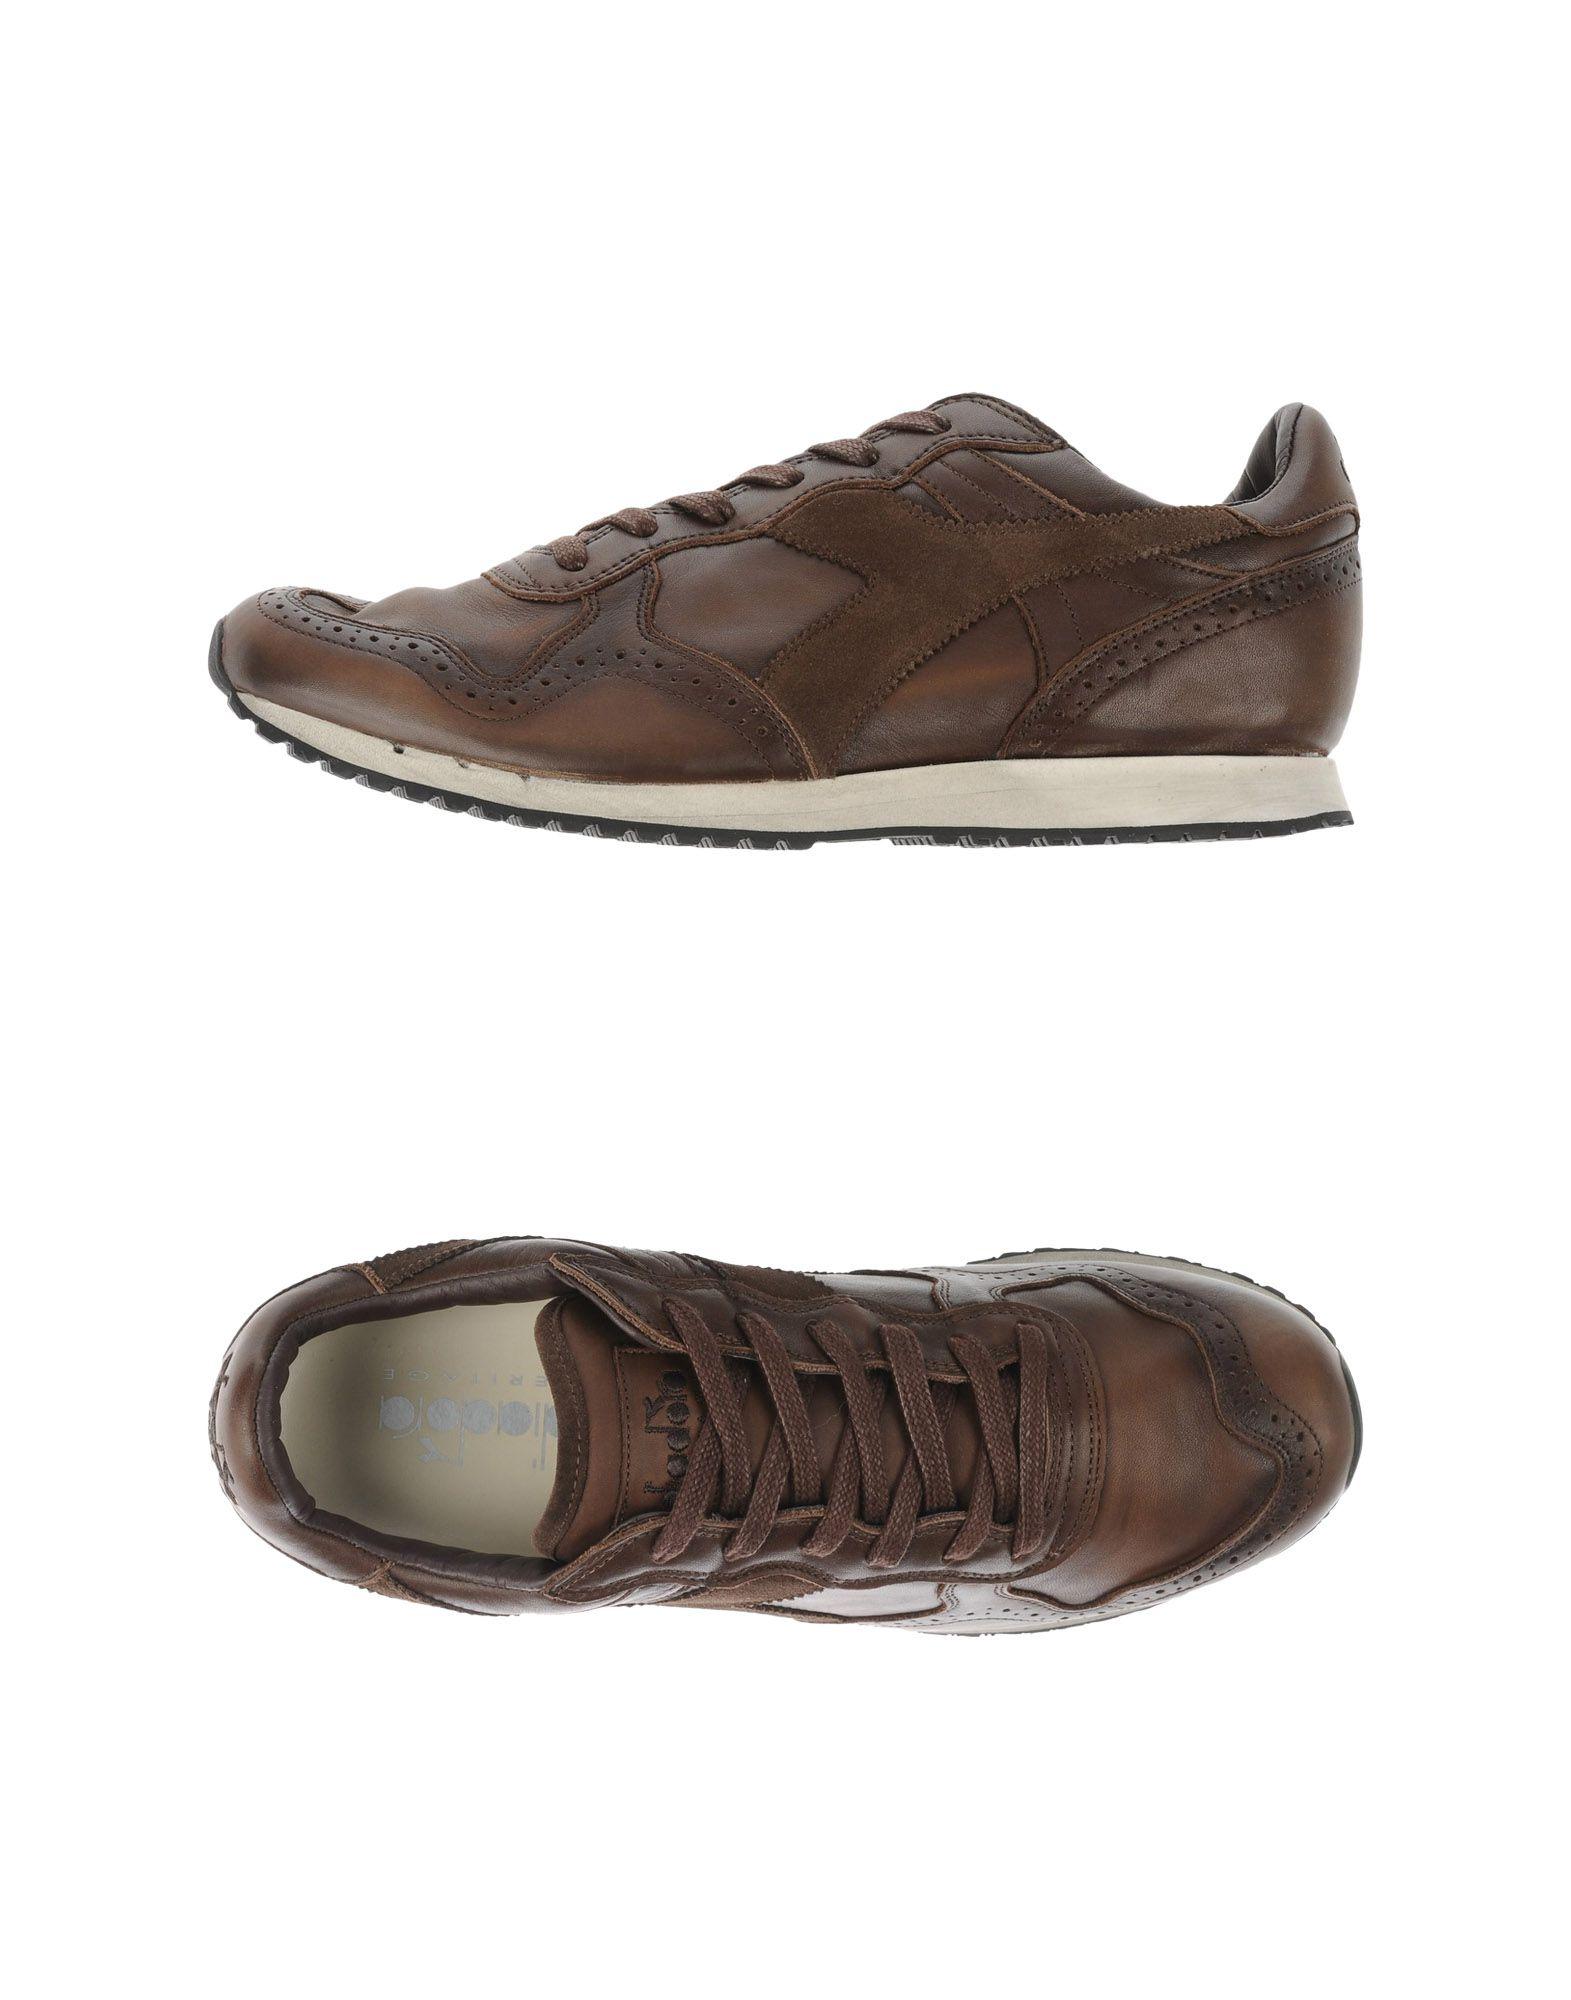 Diadora Heritage Trident Trident Trident Brogue  44922034EG Gute Qualität beliebte Schuhe 3228e5